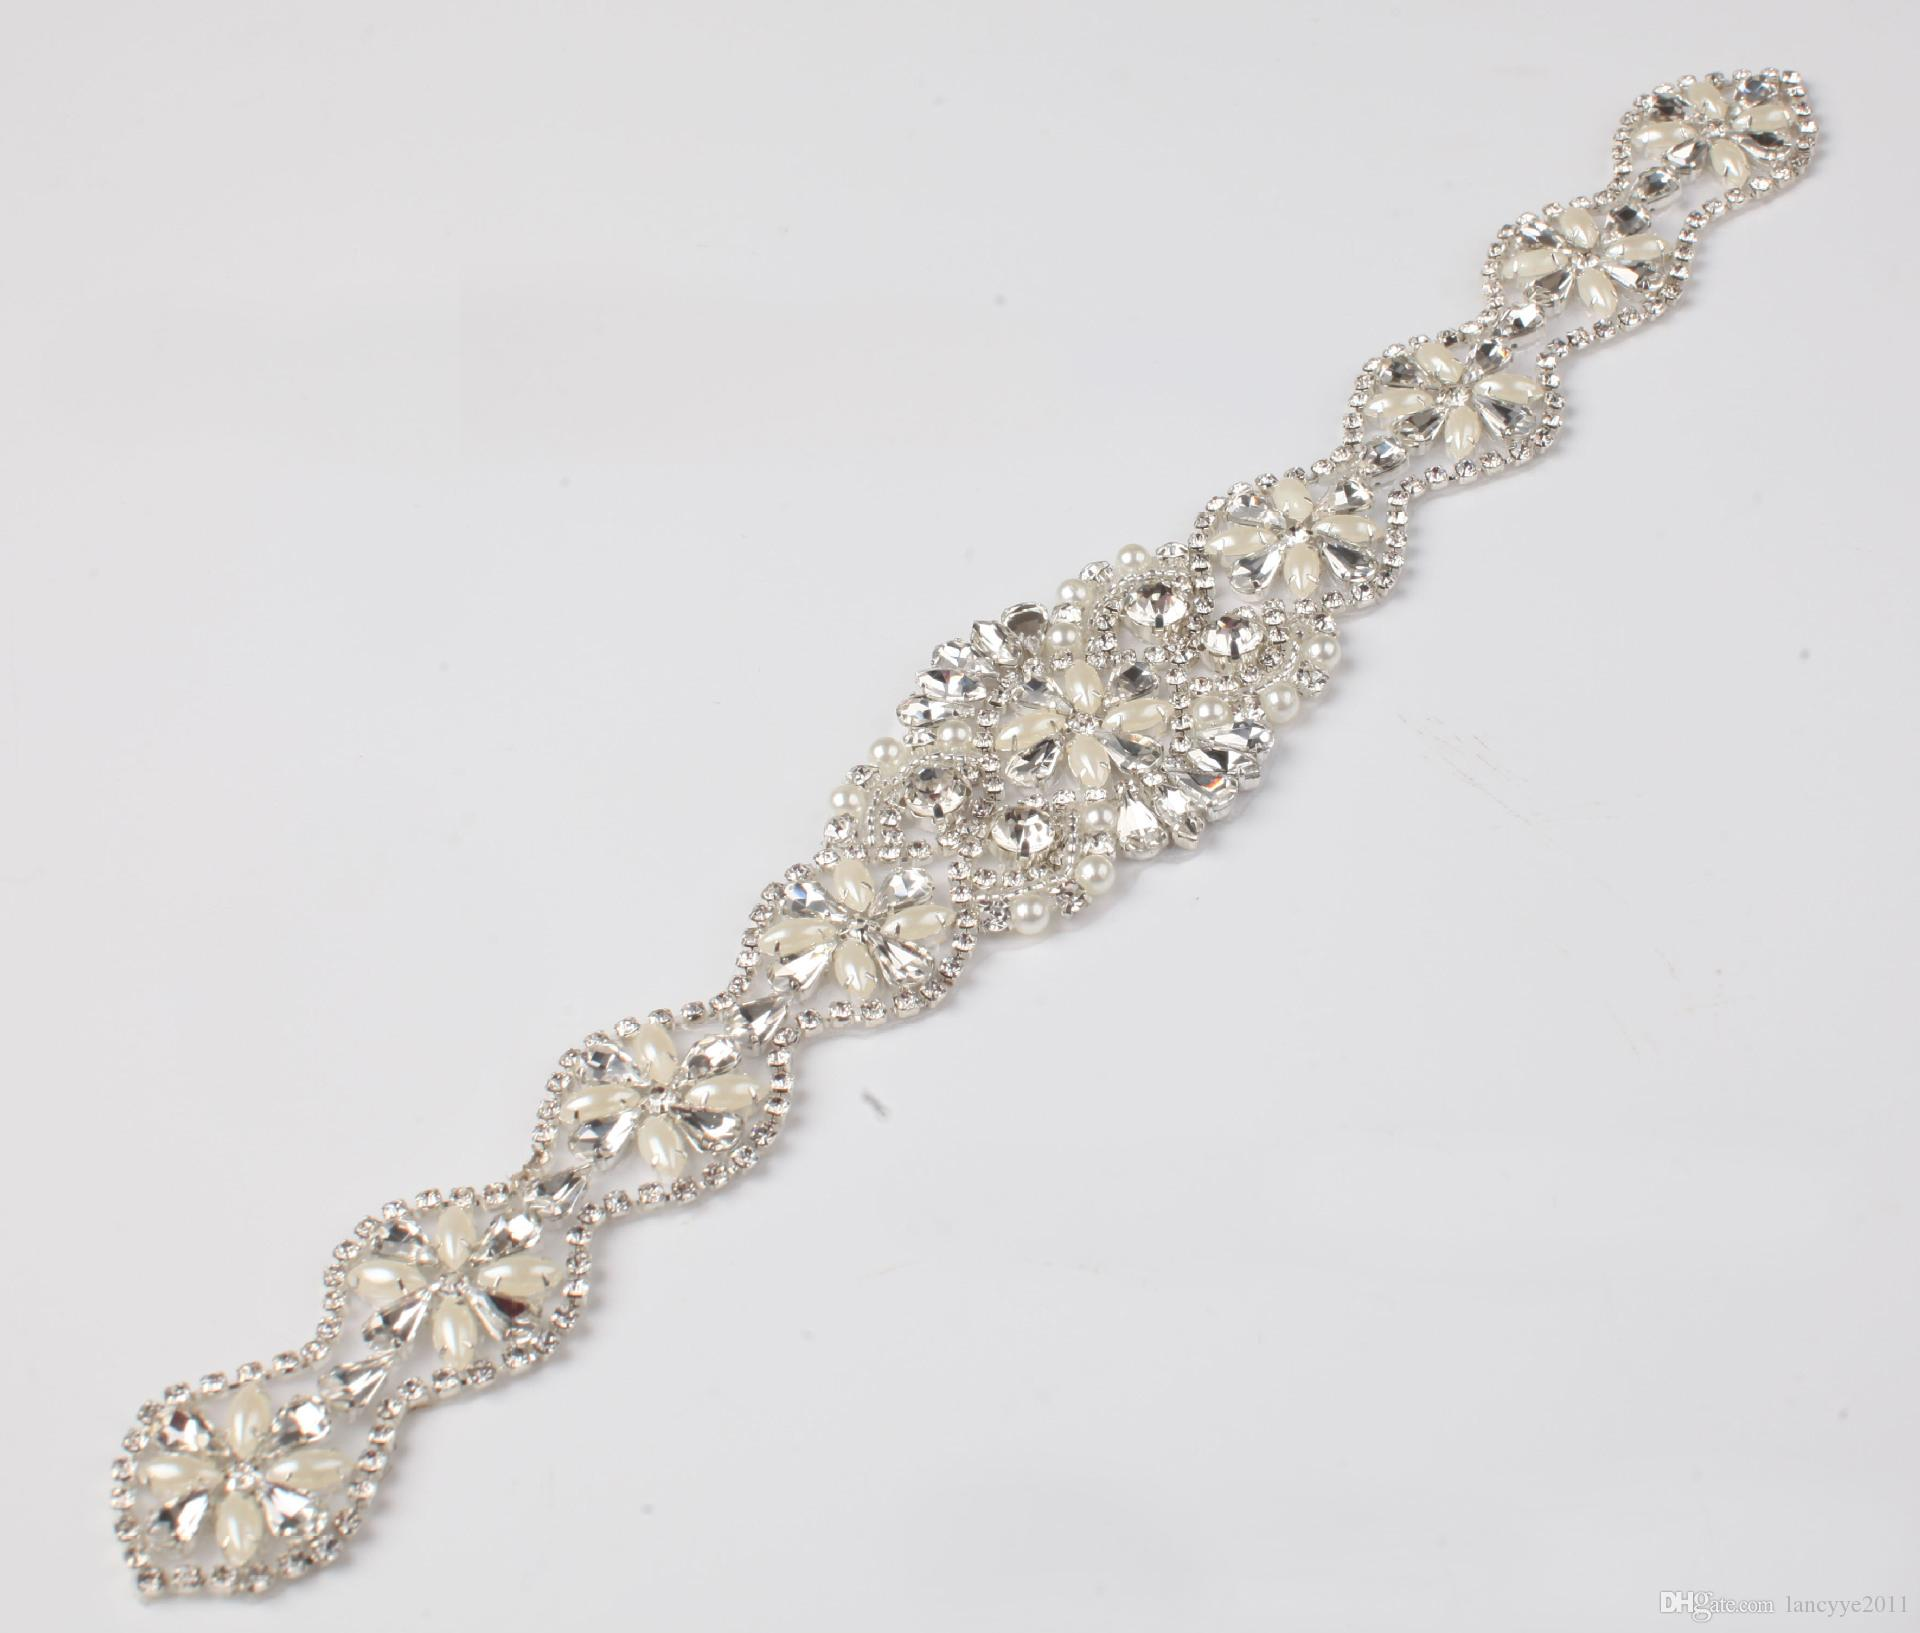 e33f823a4f (1piece) Handmade Beaded Sew On Hot Fix Iron On Sliver Crystal Rhinestone  Applique for Wedding DIY Bridal Sash Headbands Garters